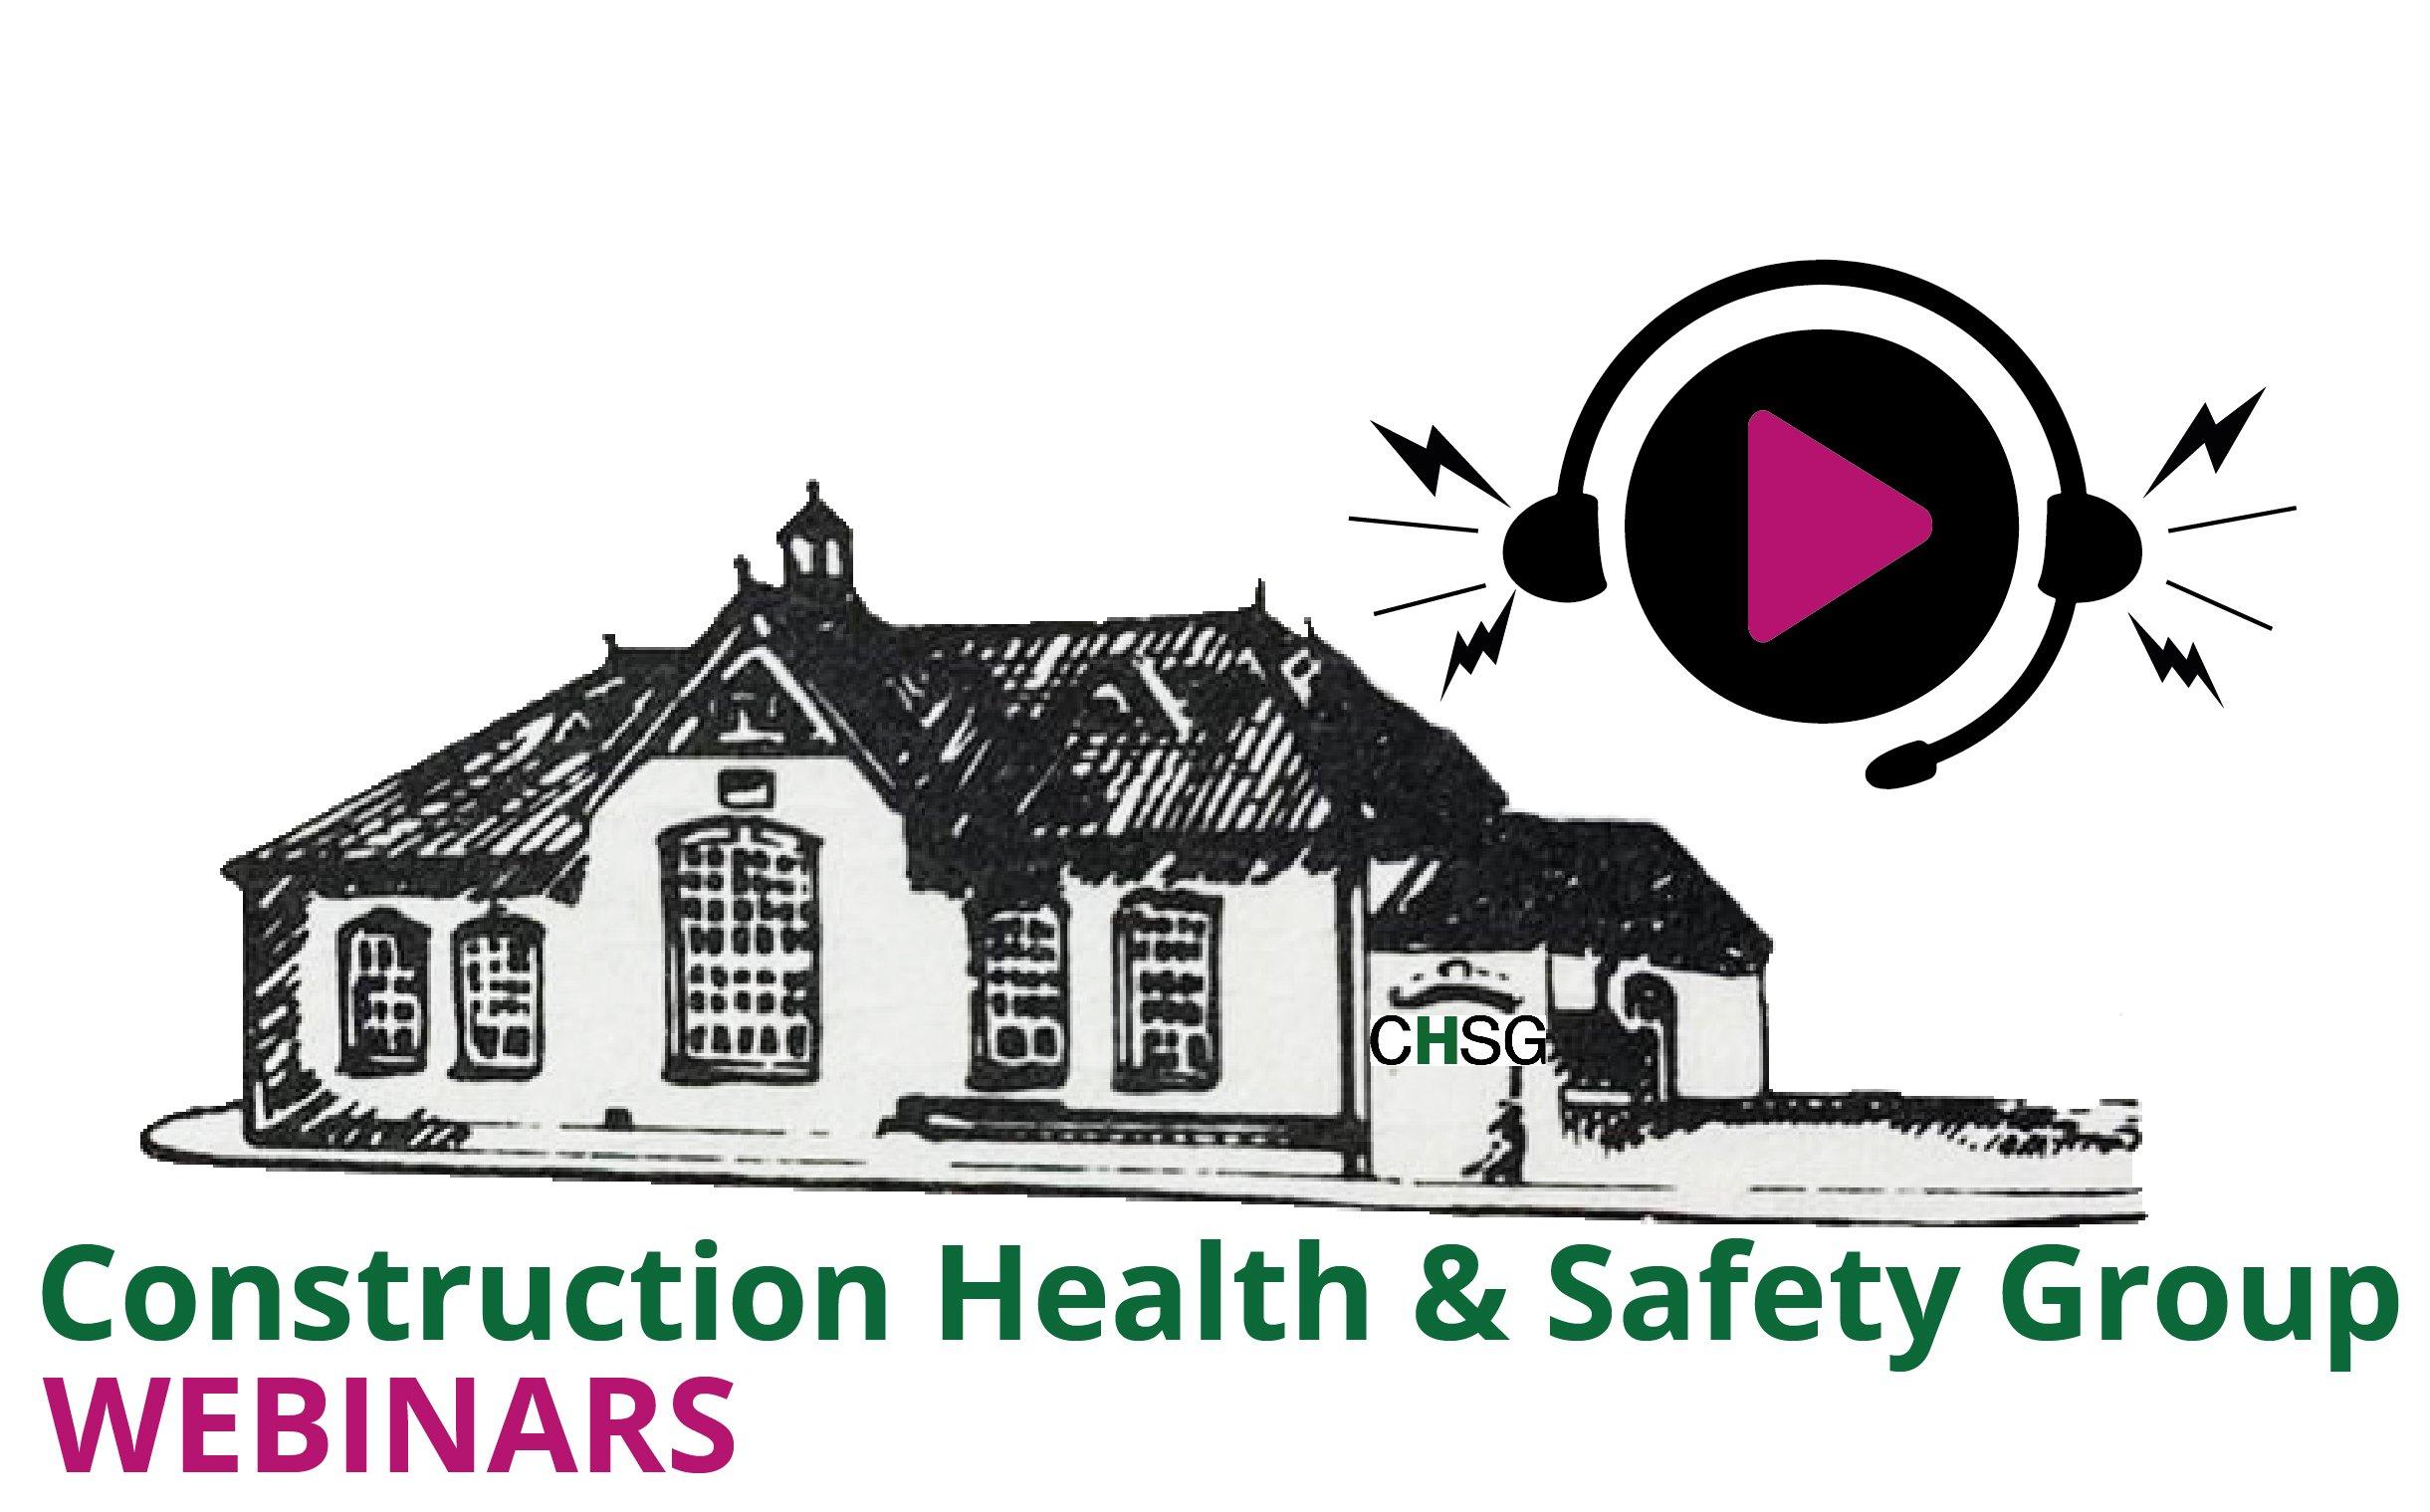 Construction Health & Safety Group WEBINARS FINAL logo-01